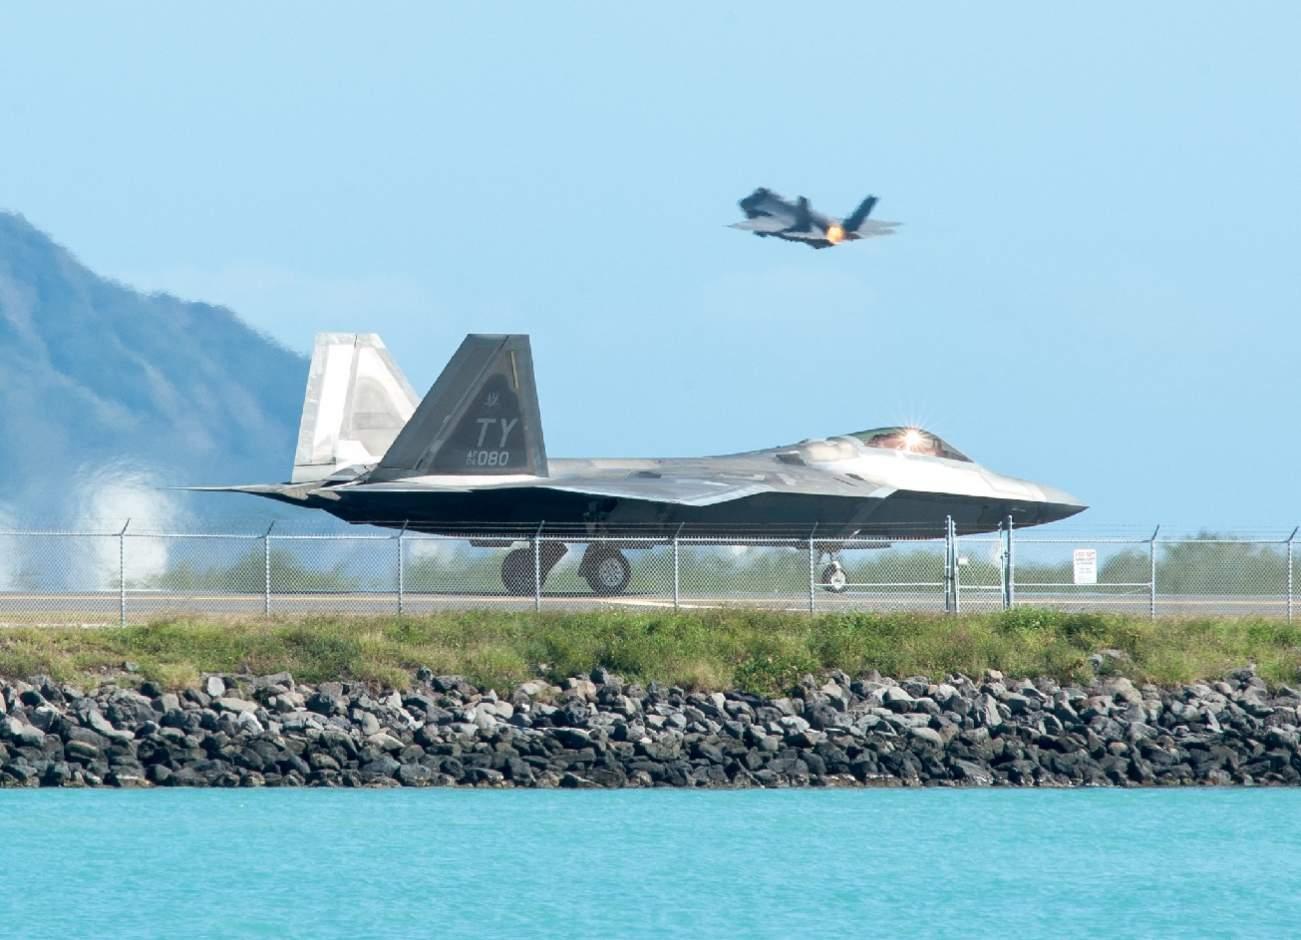 U.S. Air Force Stealth F-22s and F-35s Battled F-16s in Mock Combat